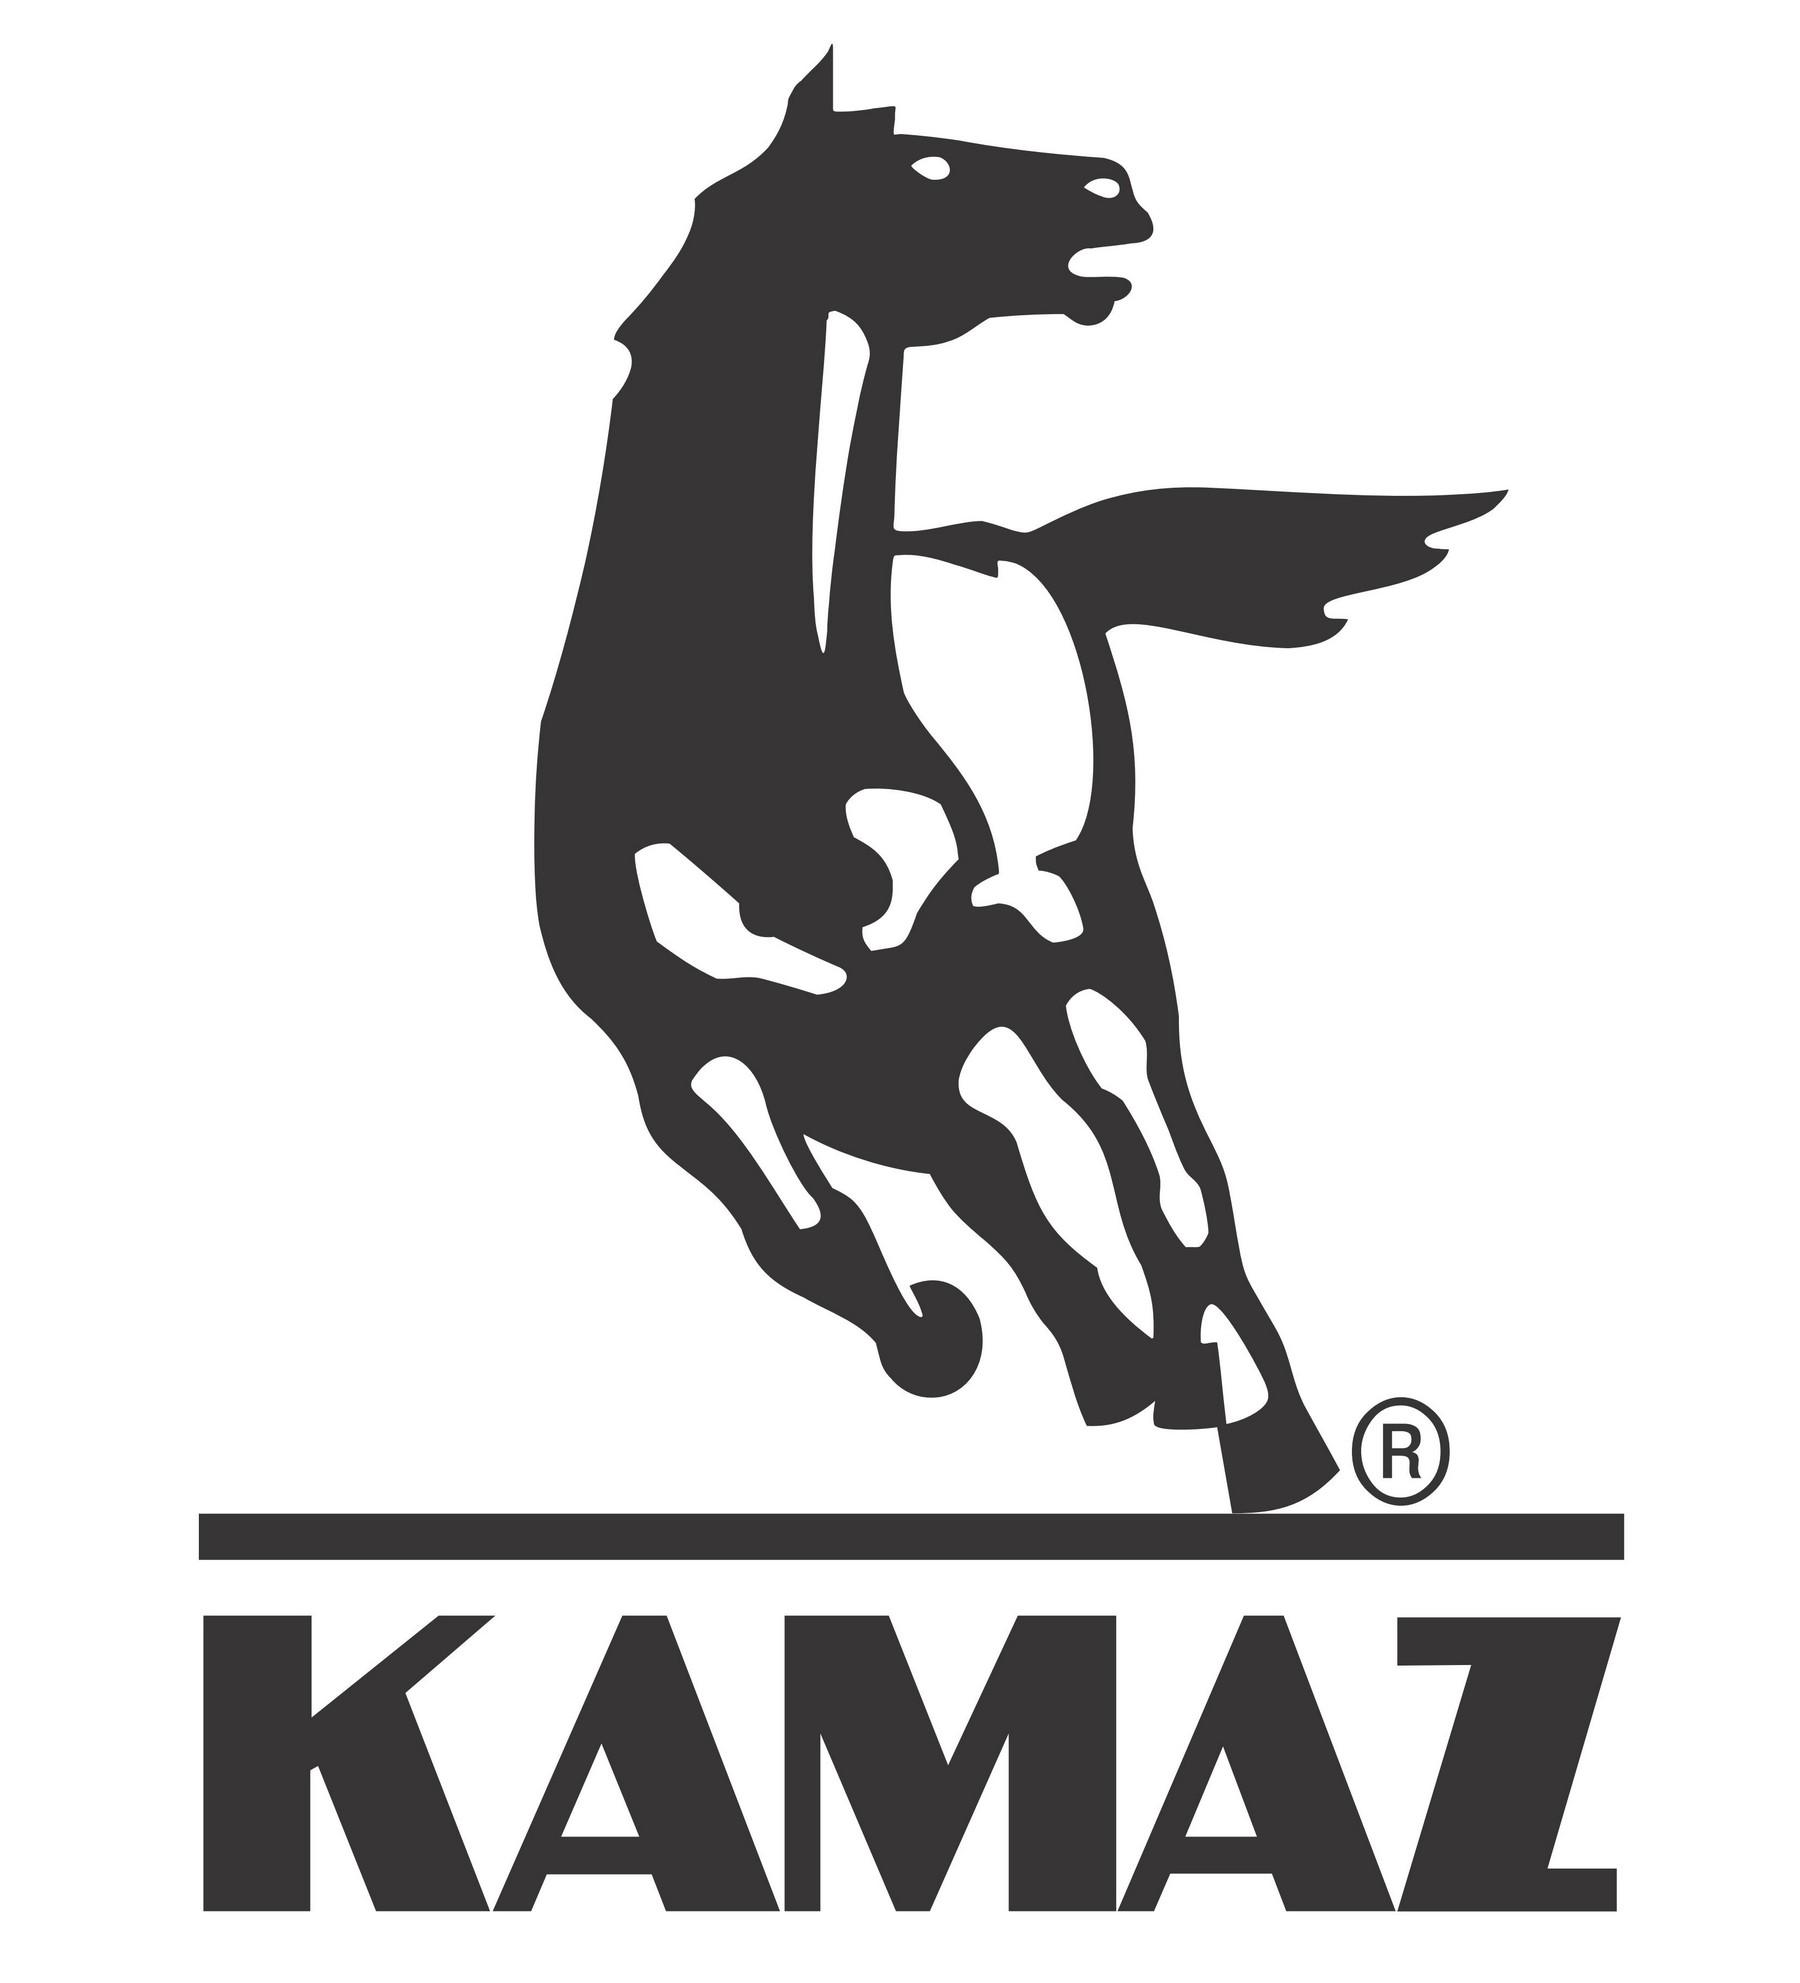 Kamaz Logo Wallpaper